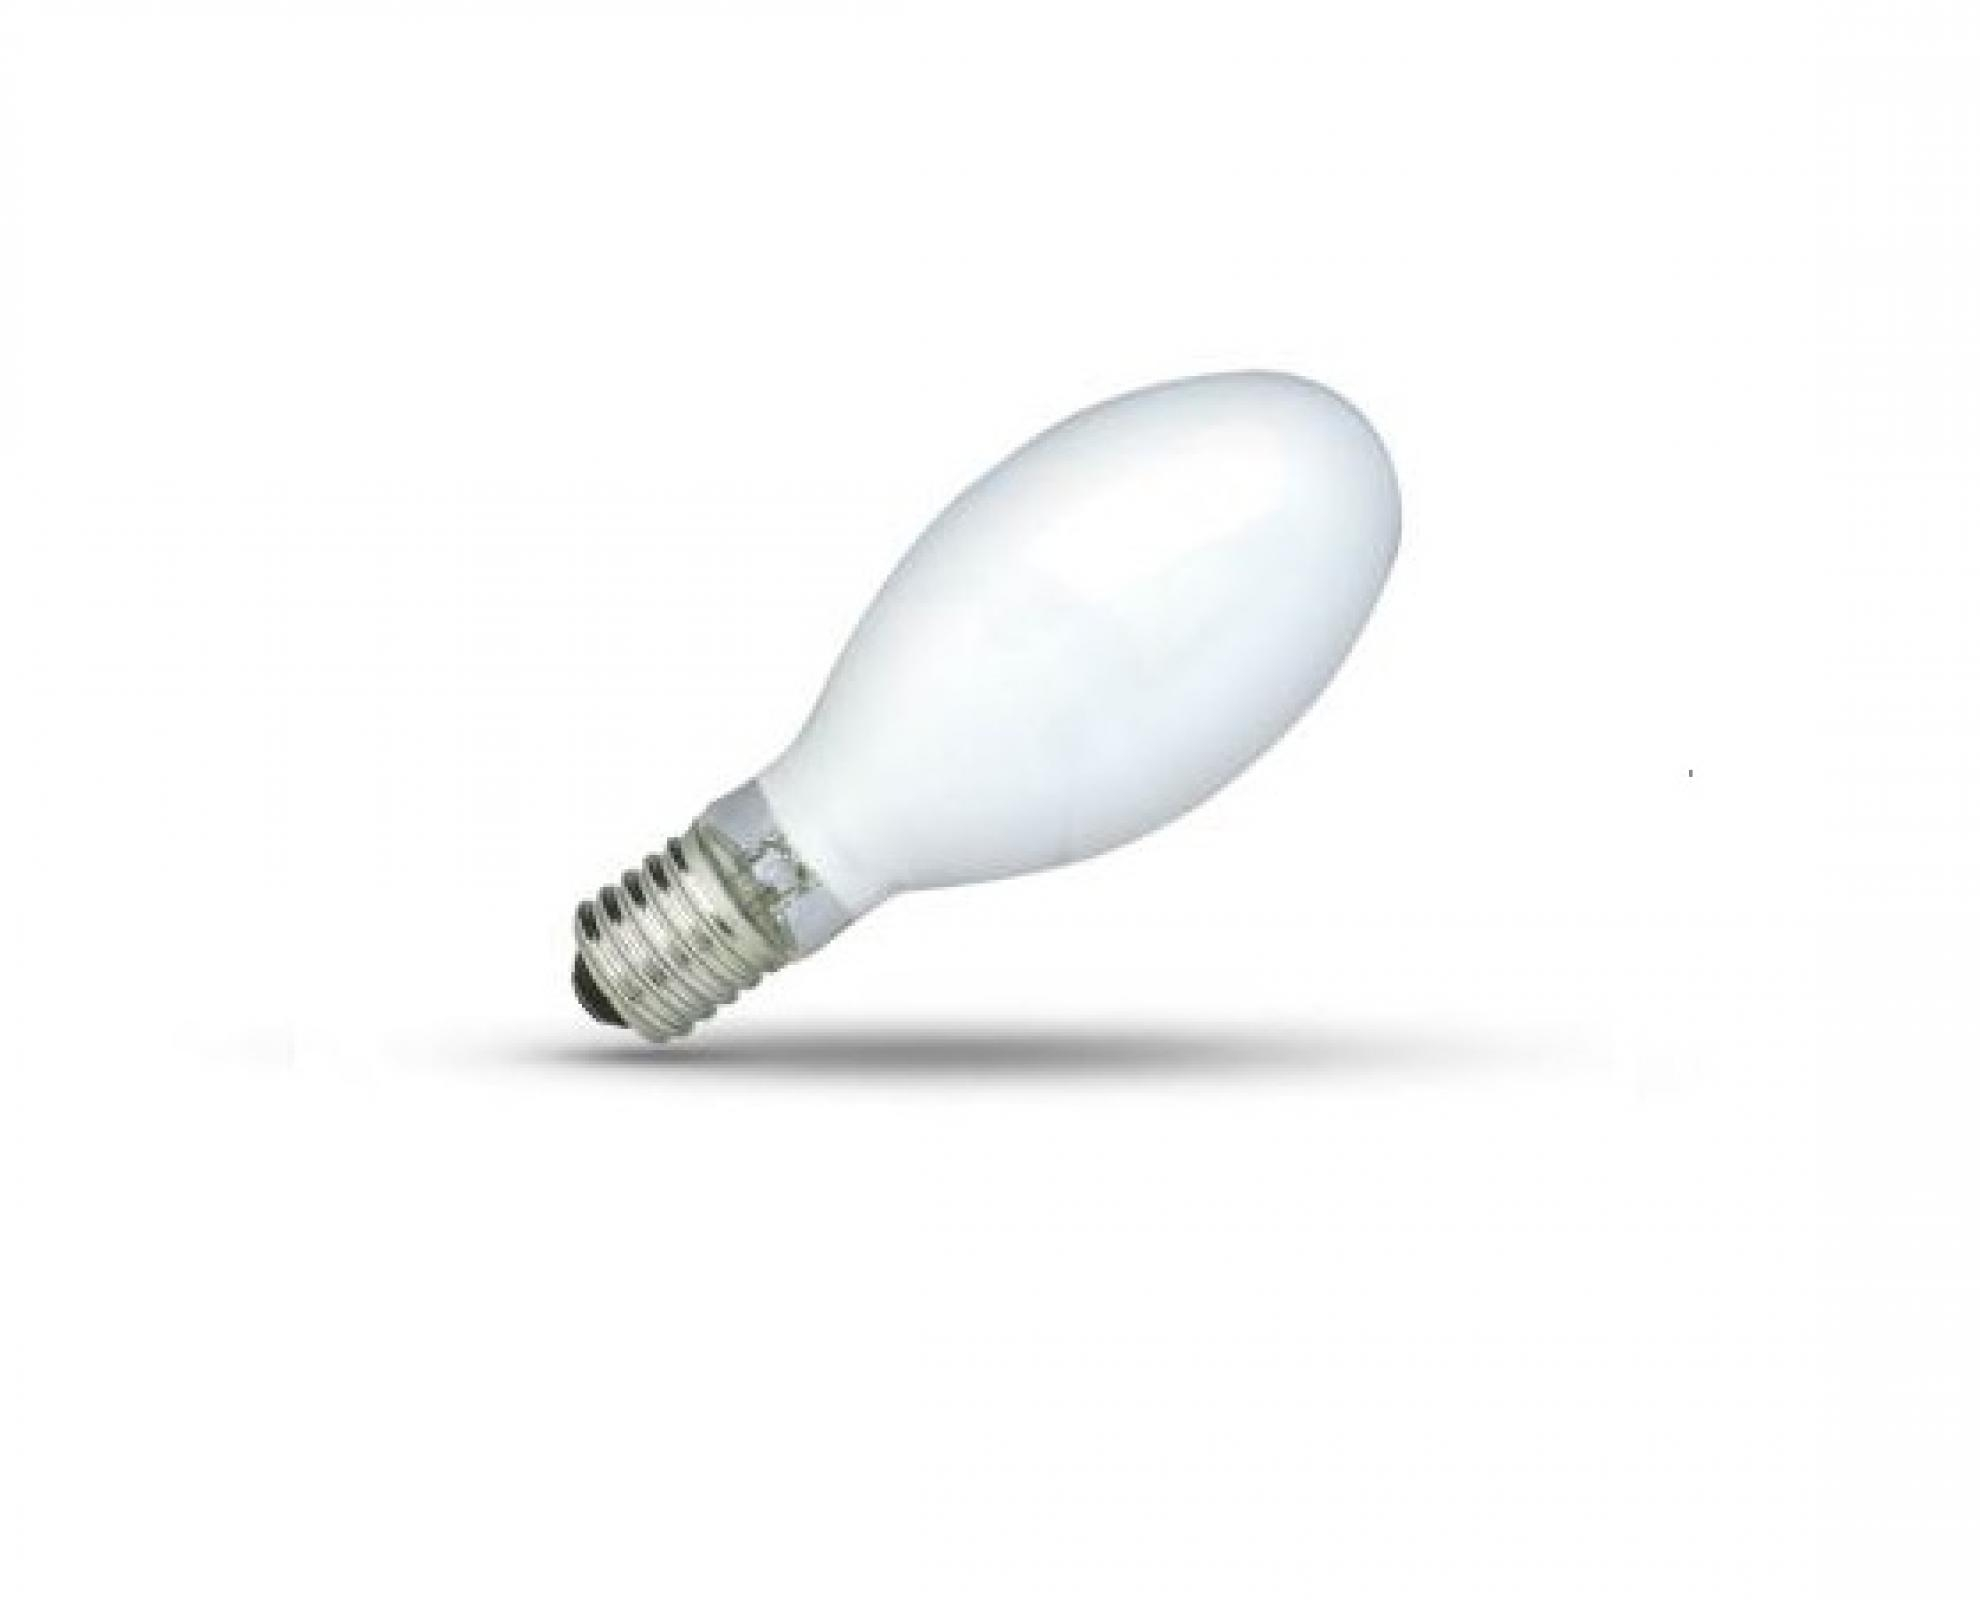 Lampada Mista 160W 220V